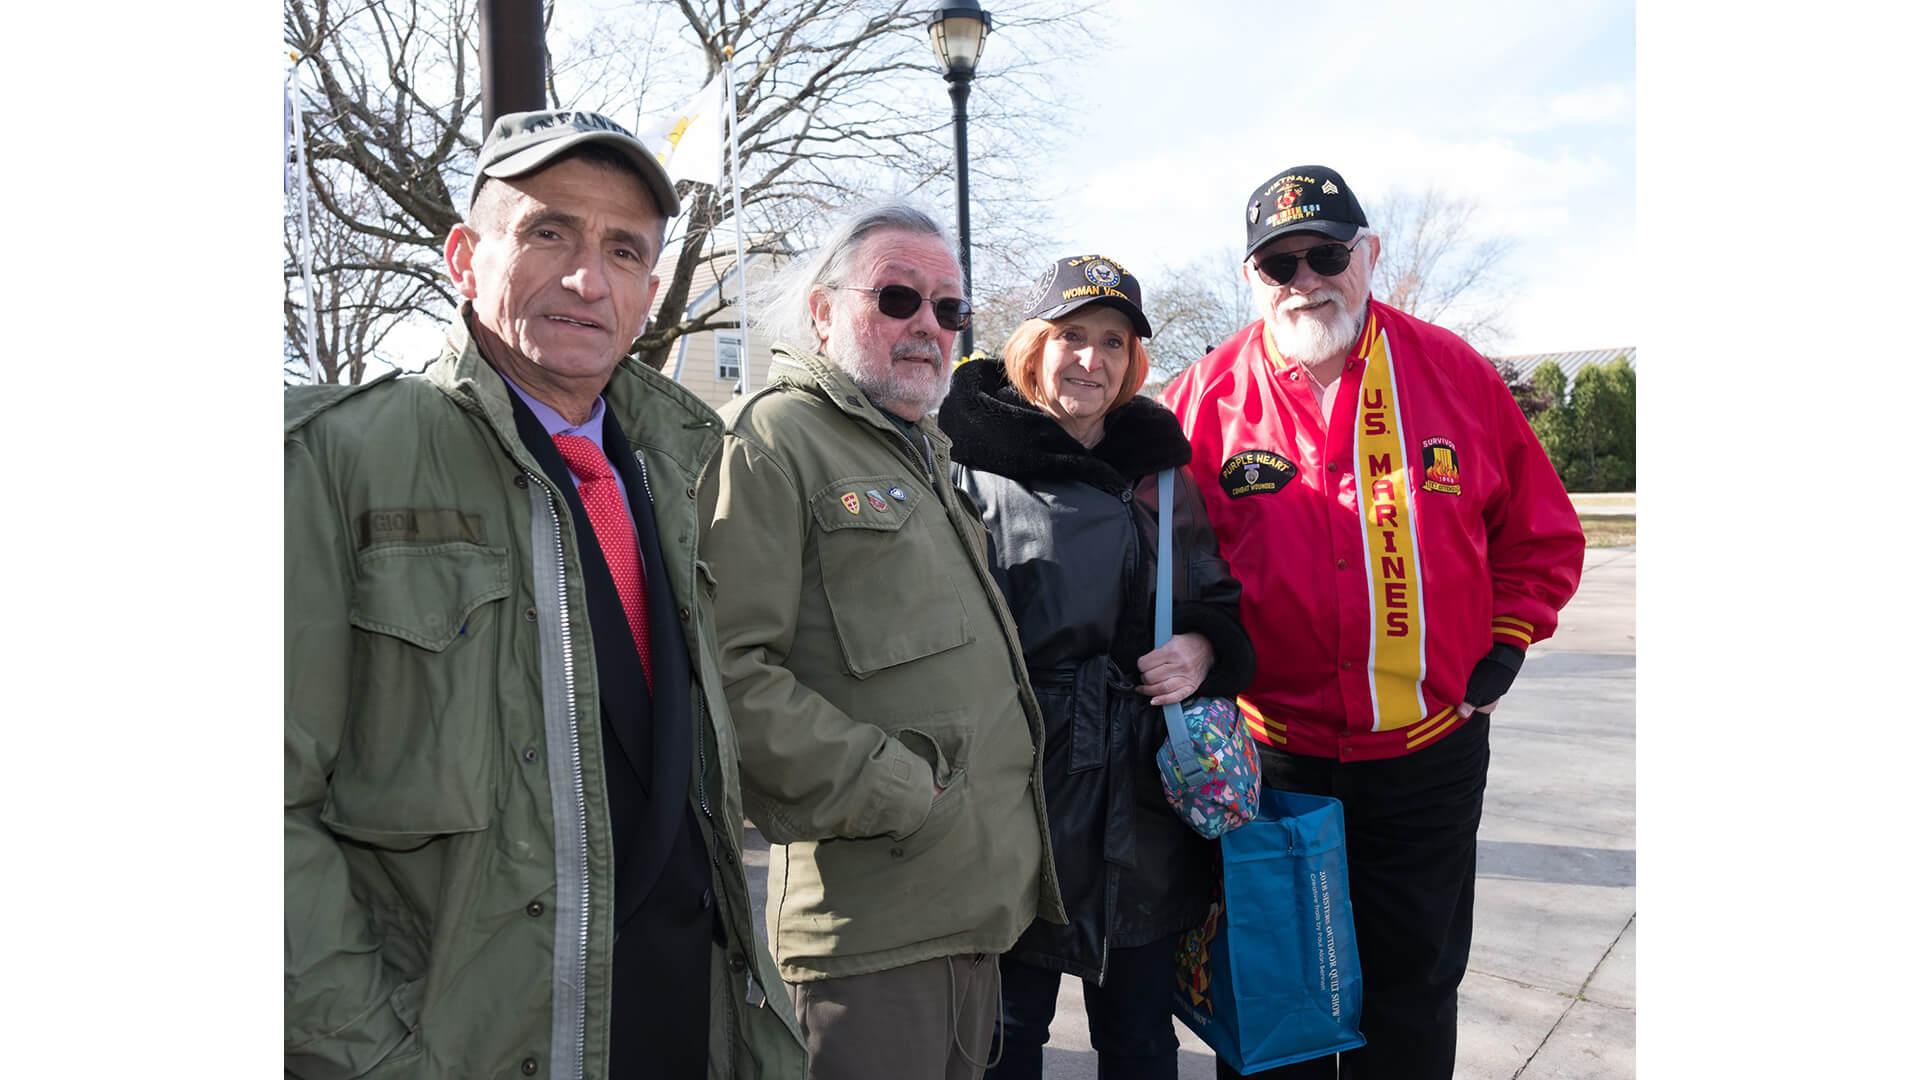 Photo of four veterans